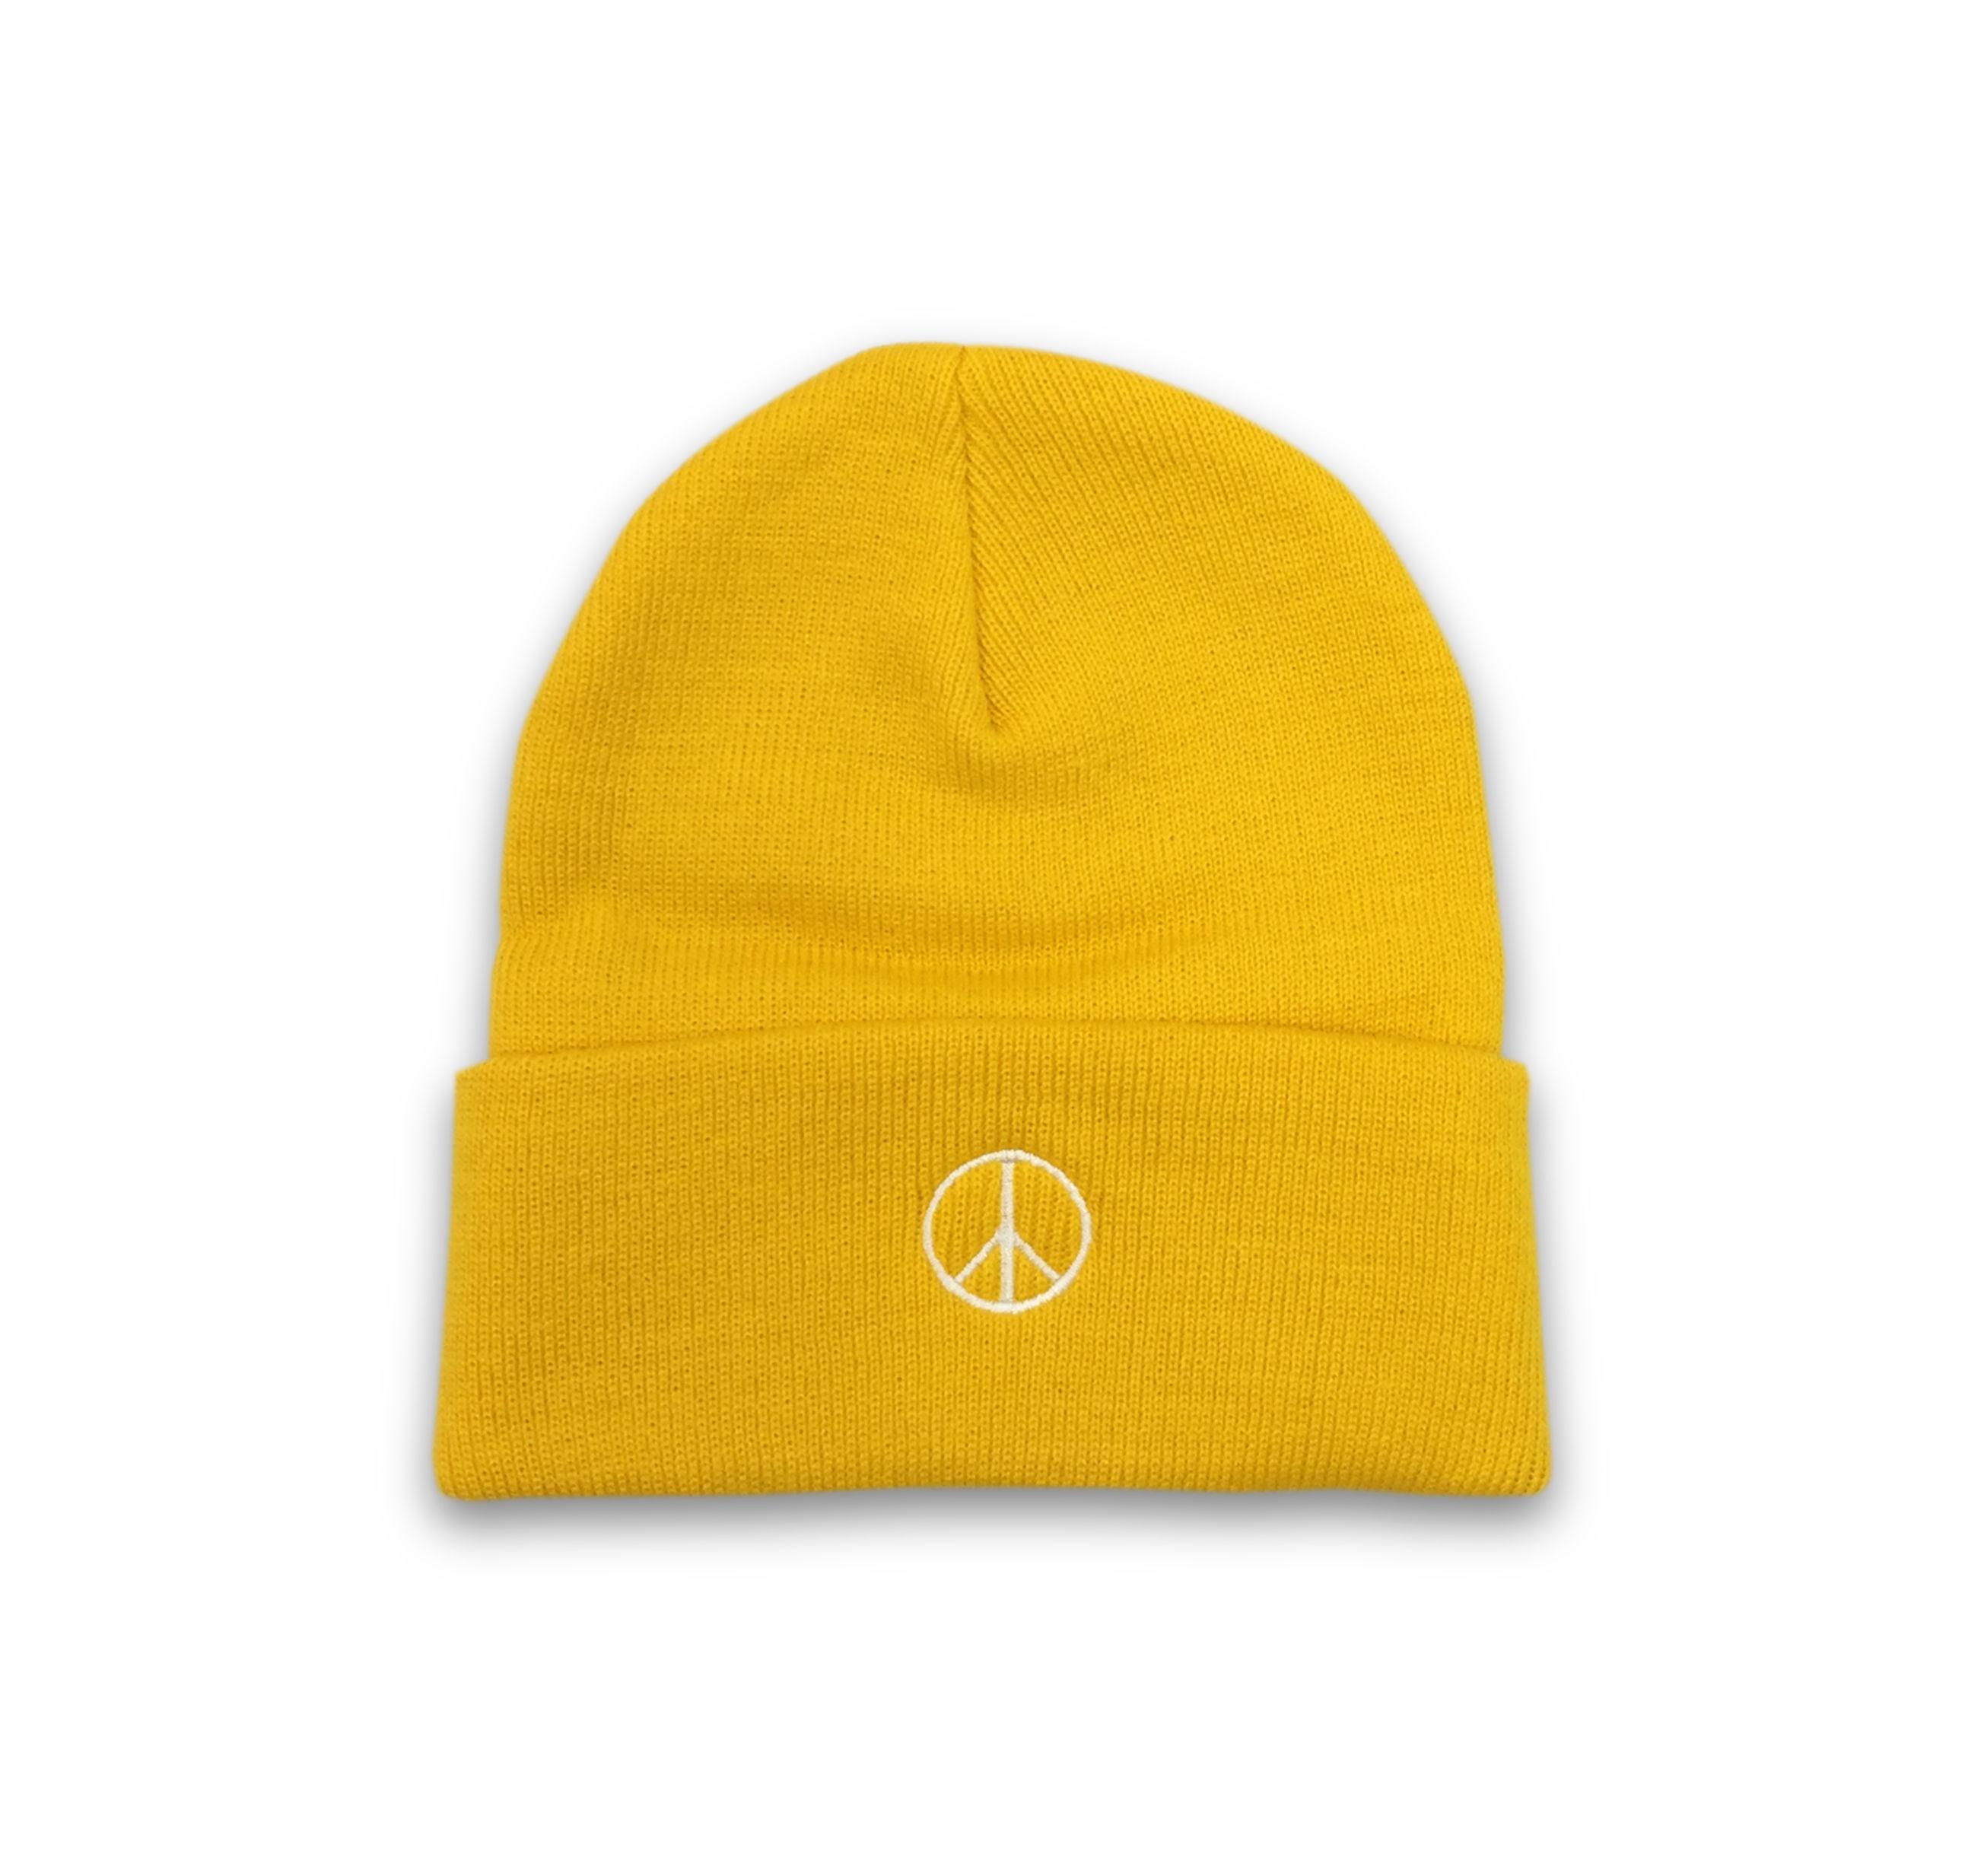 PEACE BEANIE (YELLOW)